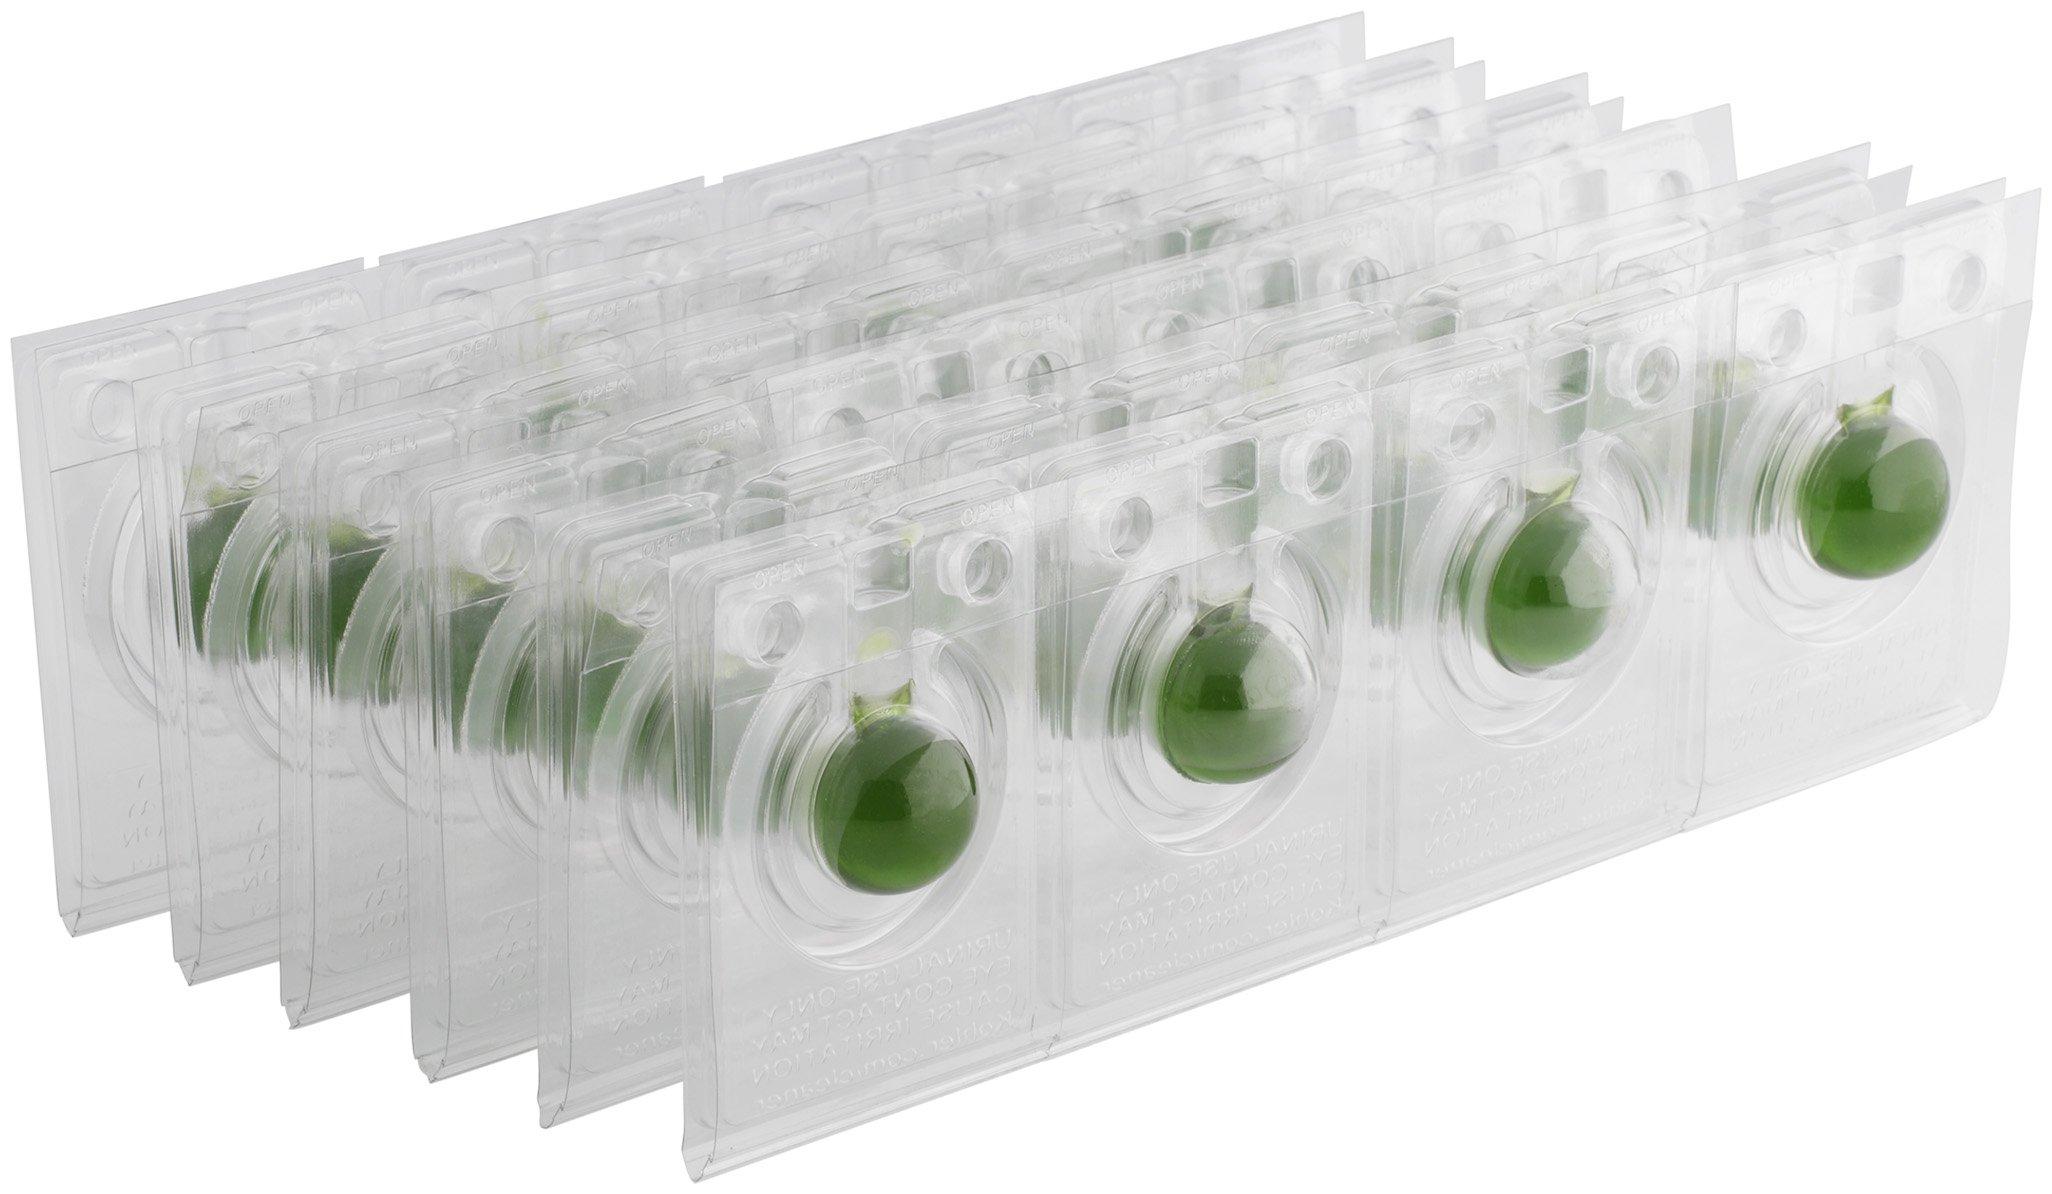 KOHLER 4929-NA Waterless Urinal Maintenance Balls (Pack of 24)